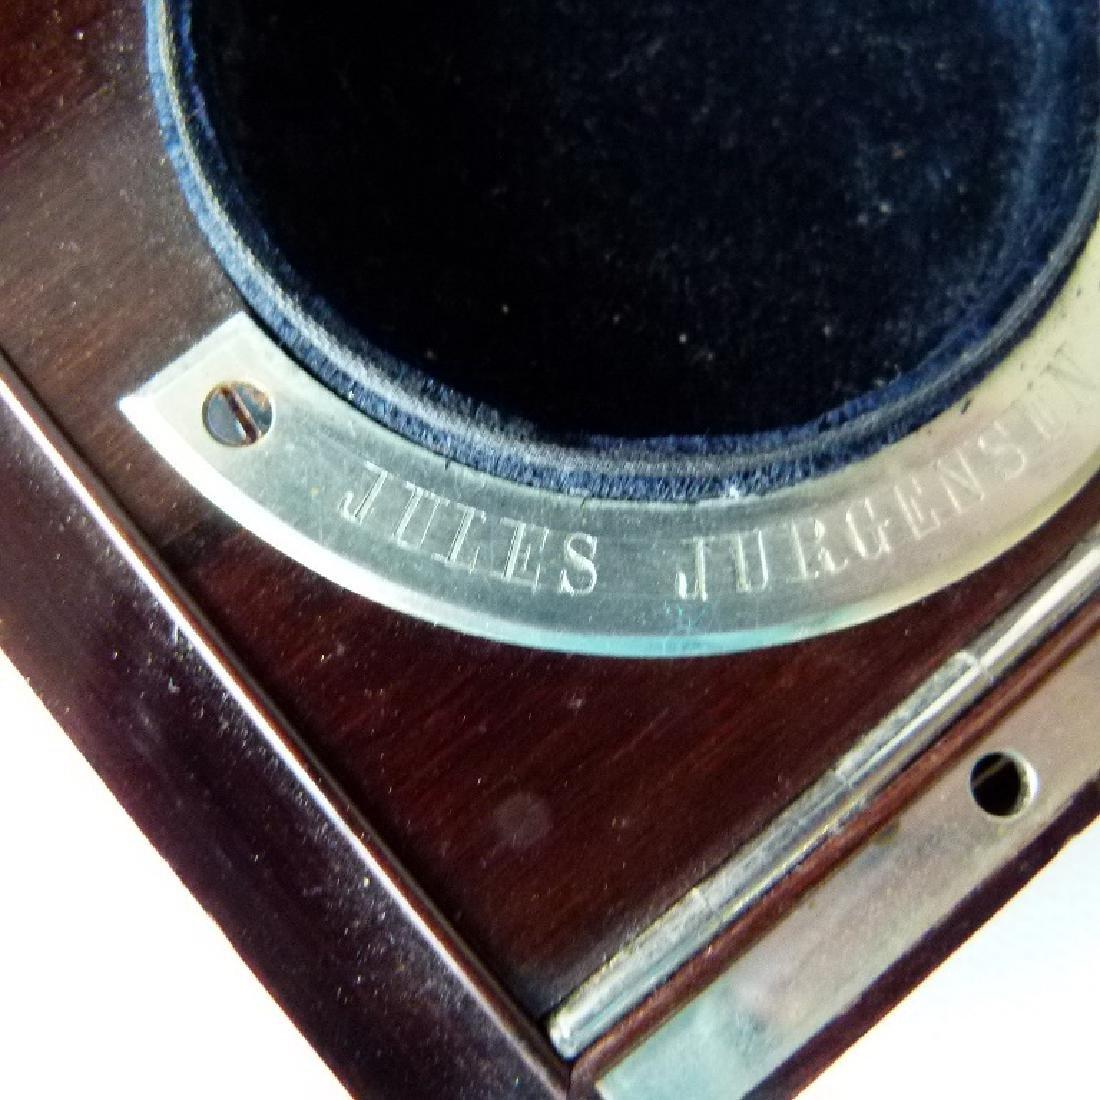 JULES JURGENSEN ROSEWOOD POCKET WATCH BOX - 2